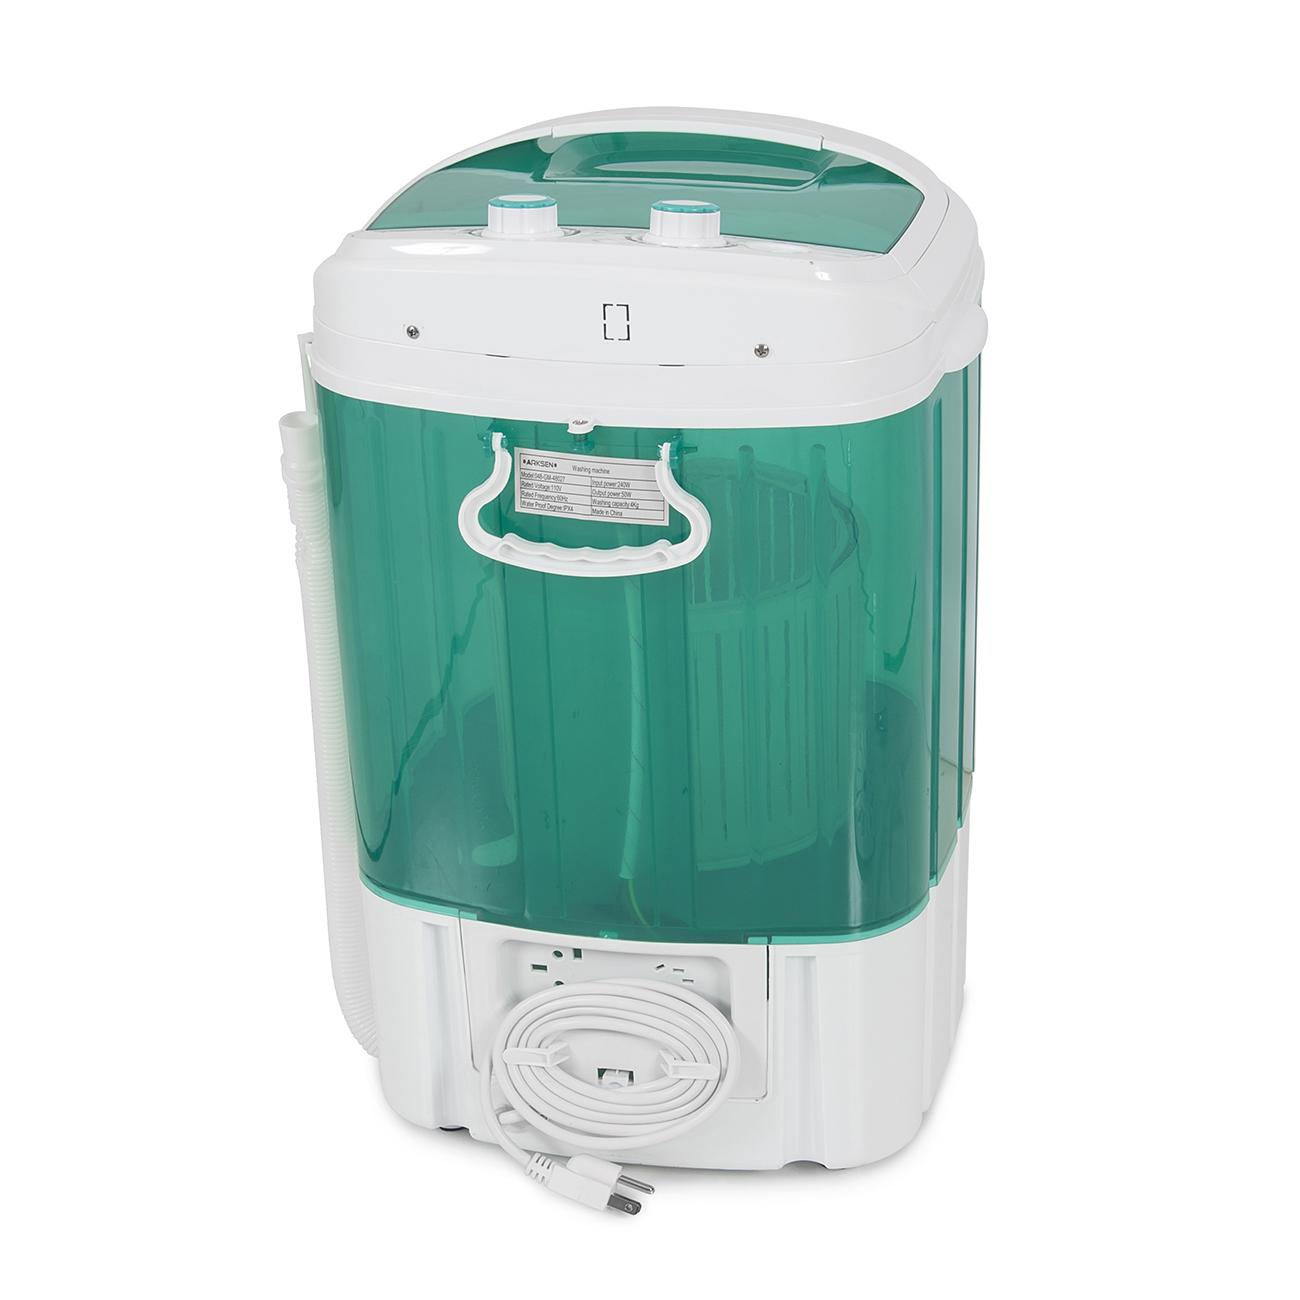 rv portable washing machine